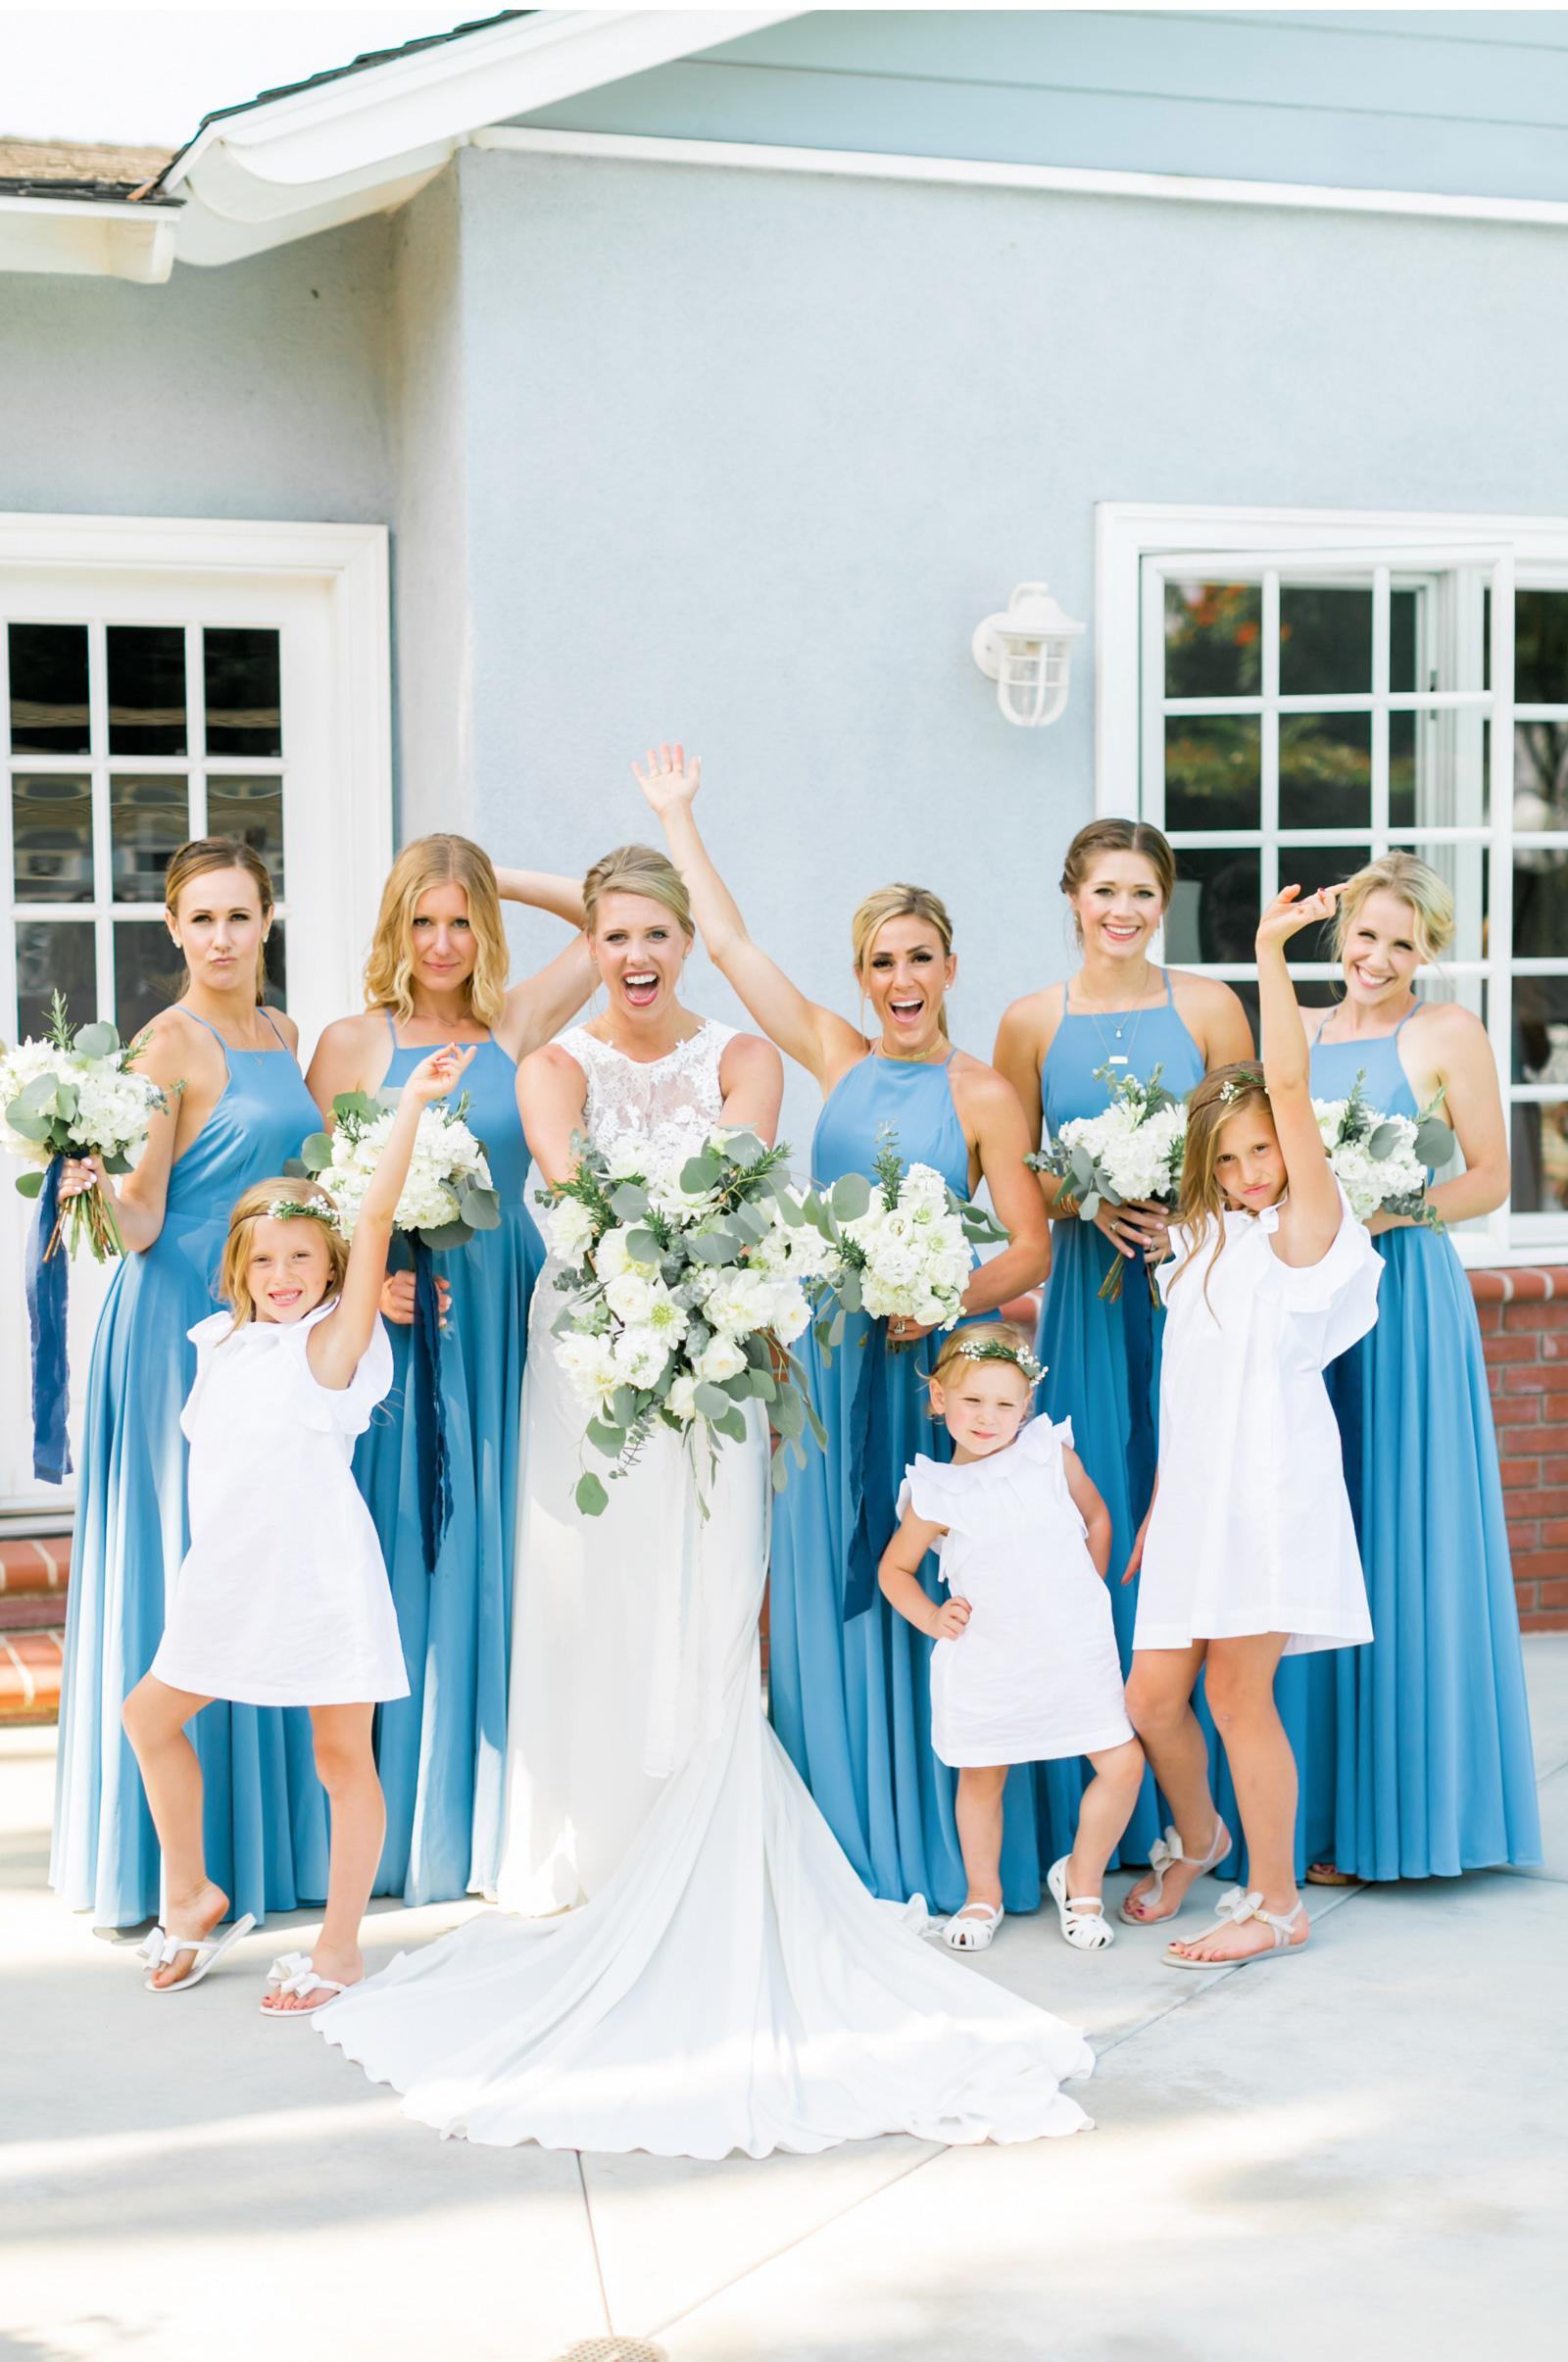 Natalie-Schutt-Photography-fine-art-film-southern-california-wedding.jpg